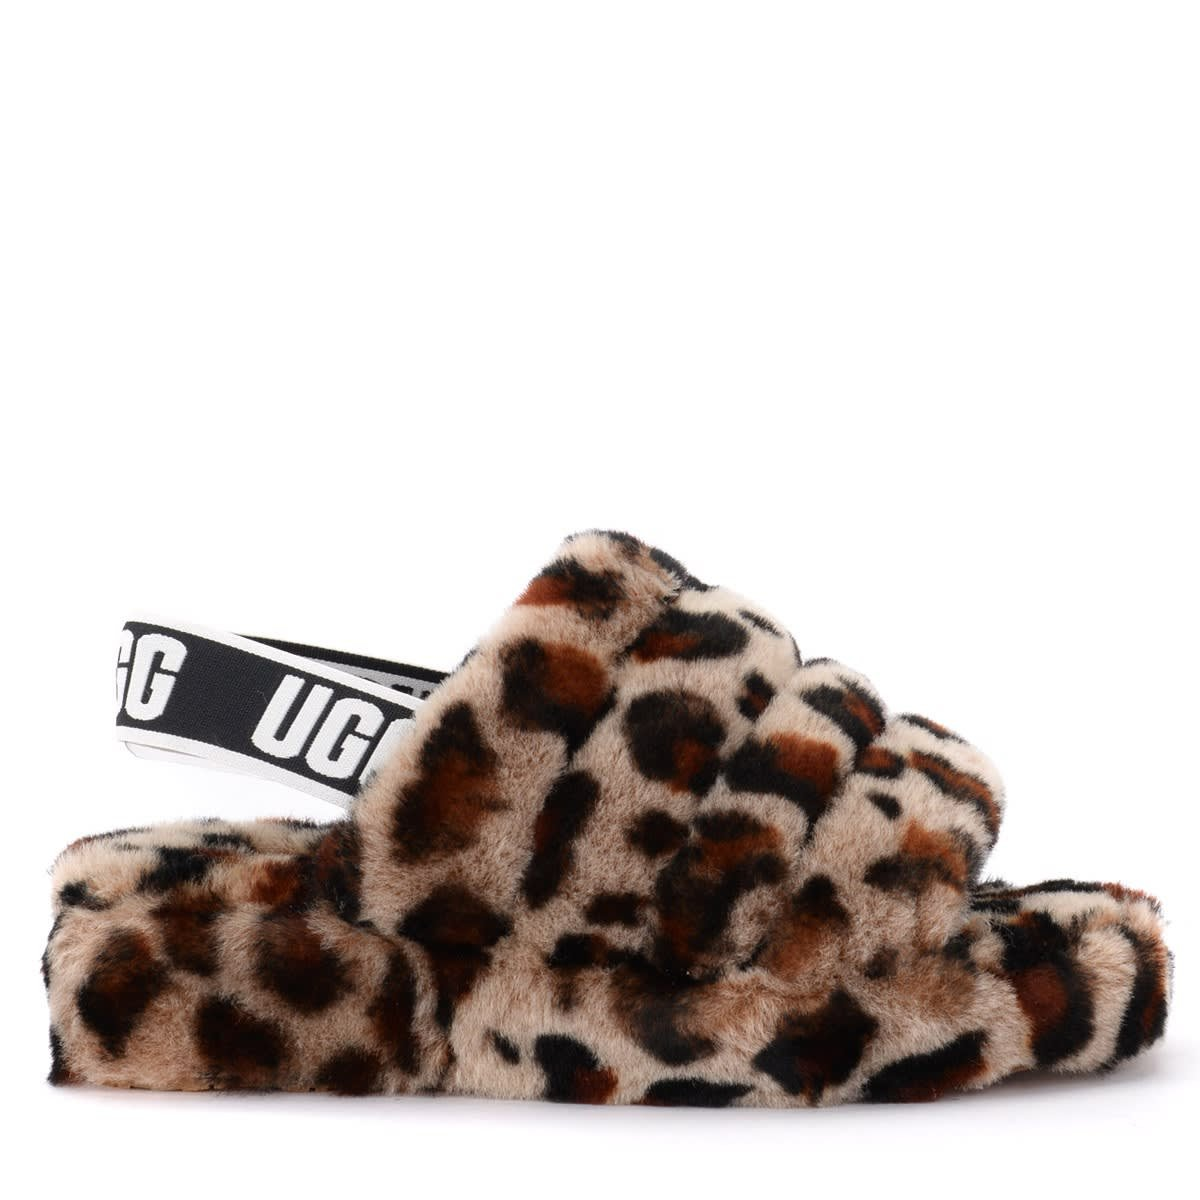 Ugg Fluff Yeah Sandal Slipper Made Of Soft Leopard Leather